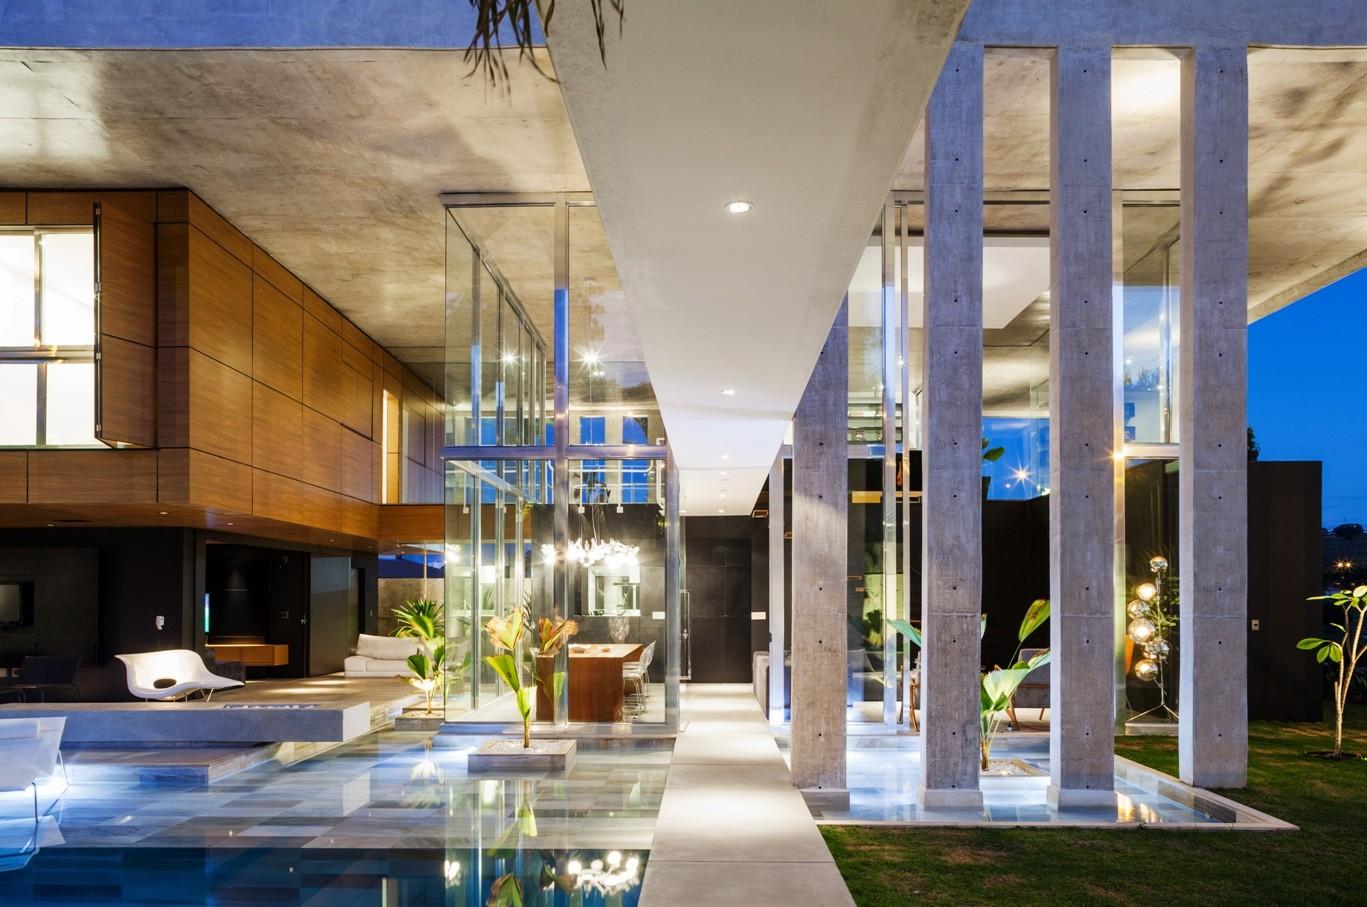 Botucatu House / FGMF Arquitetos, © Rafaela Netto